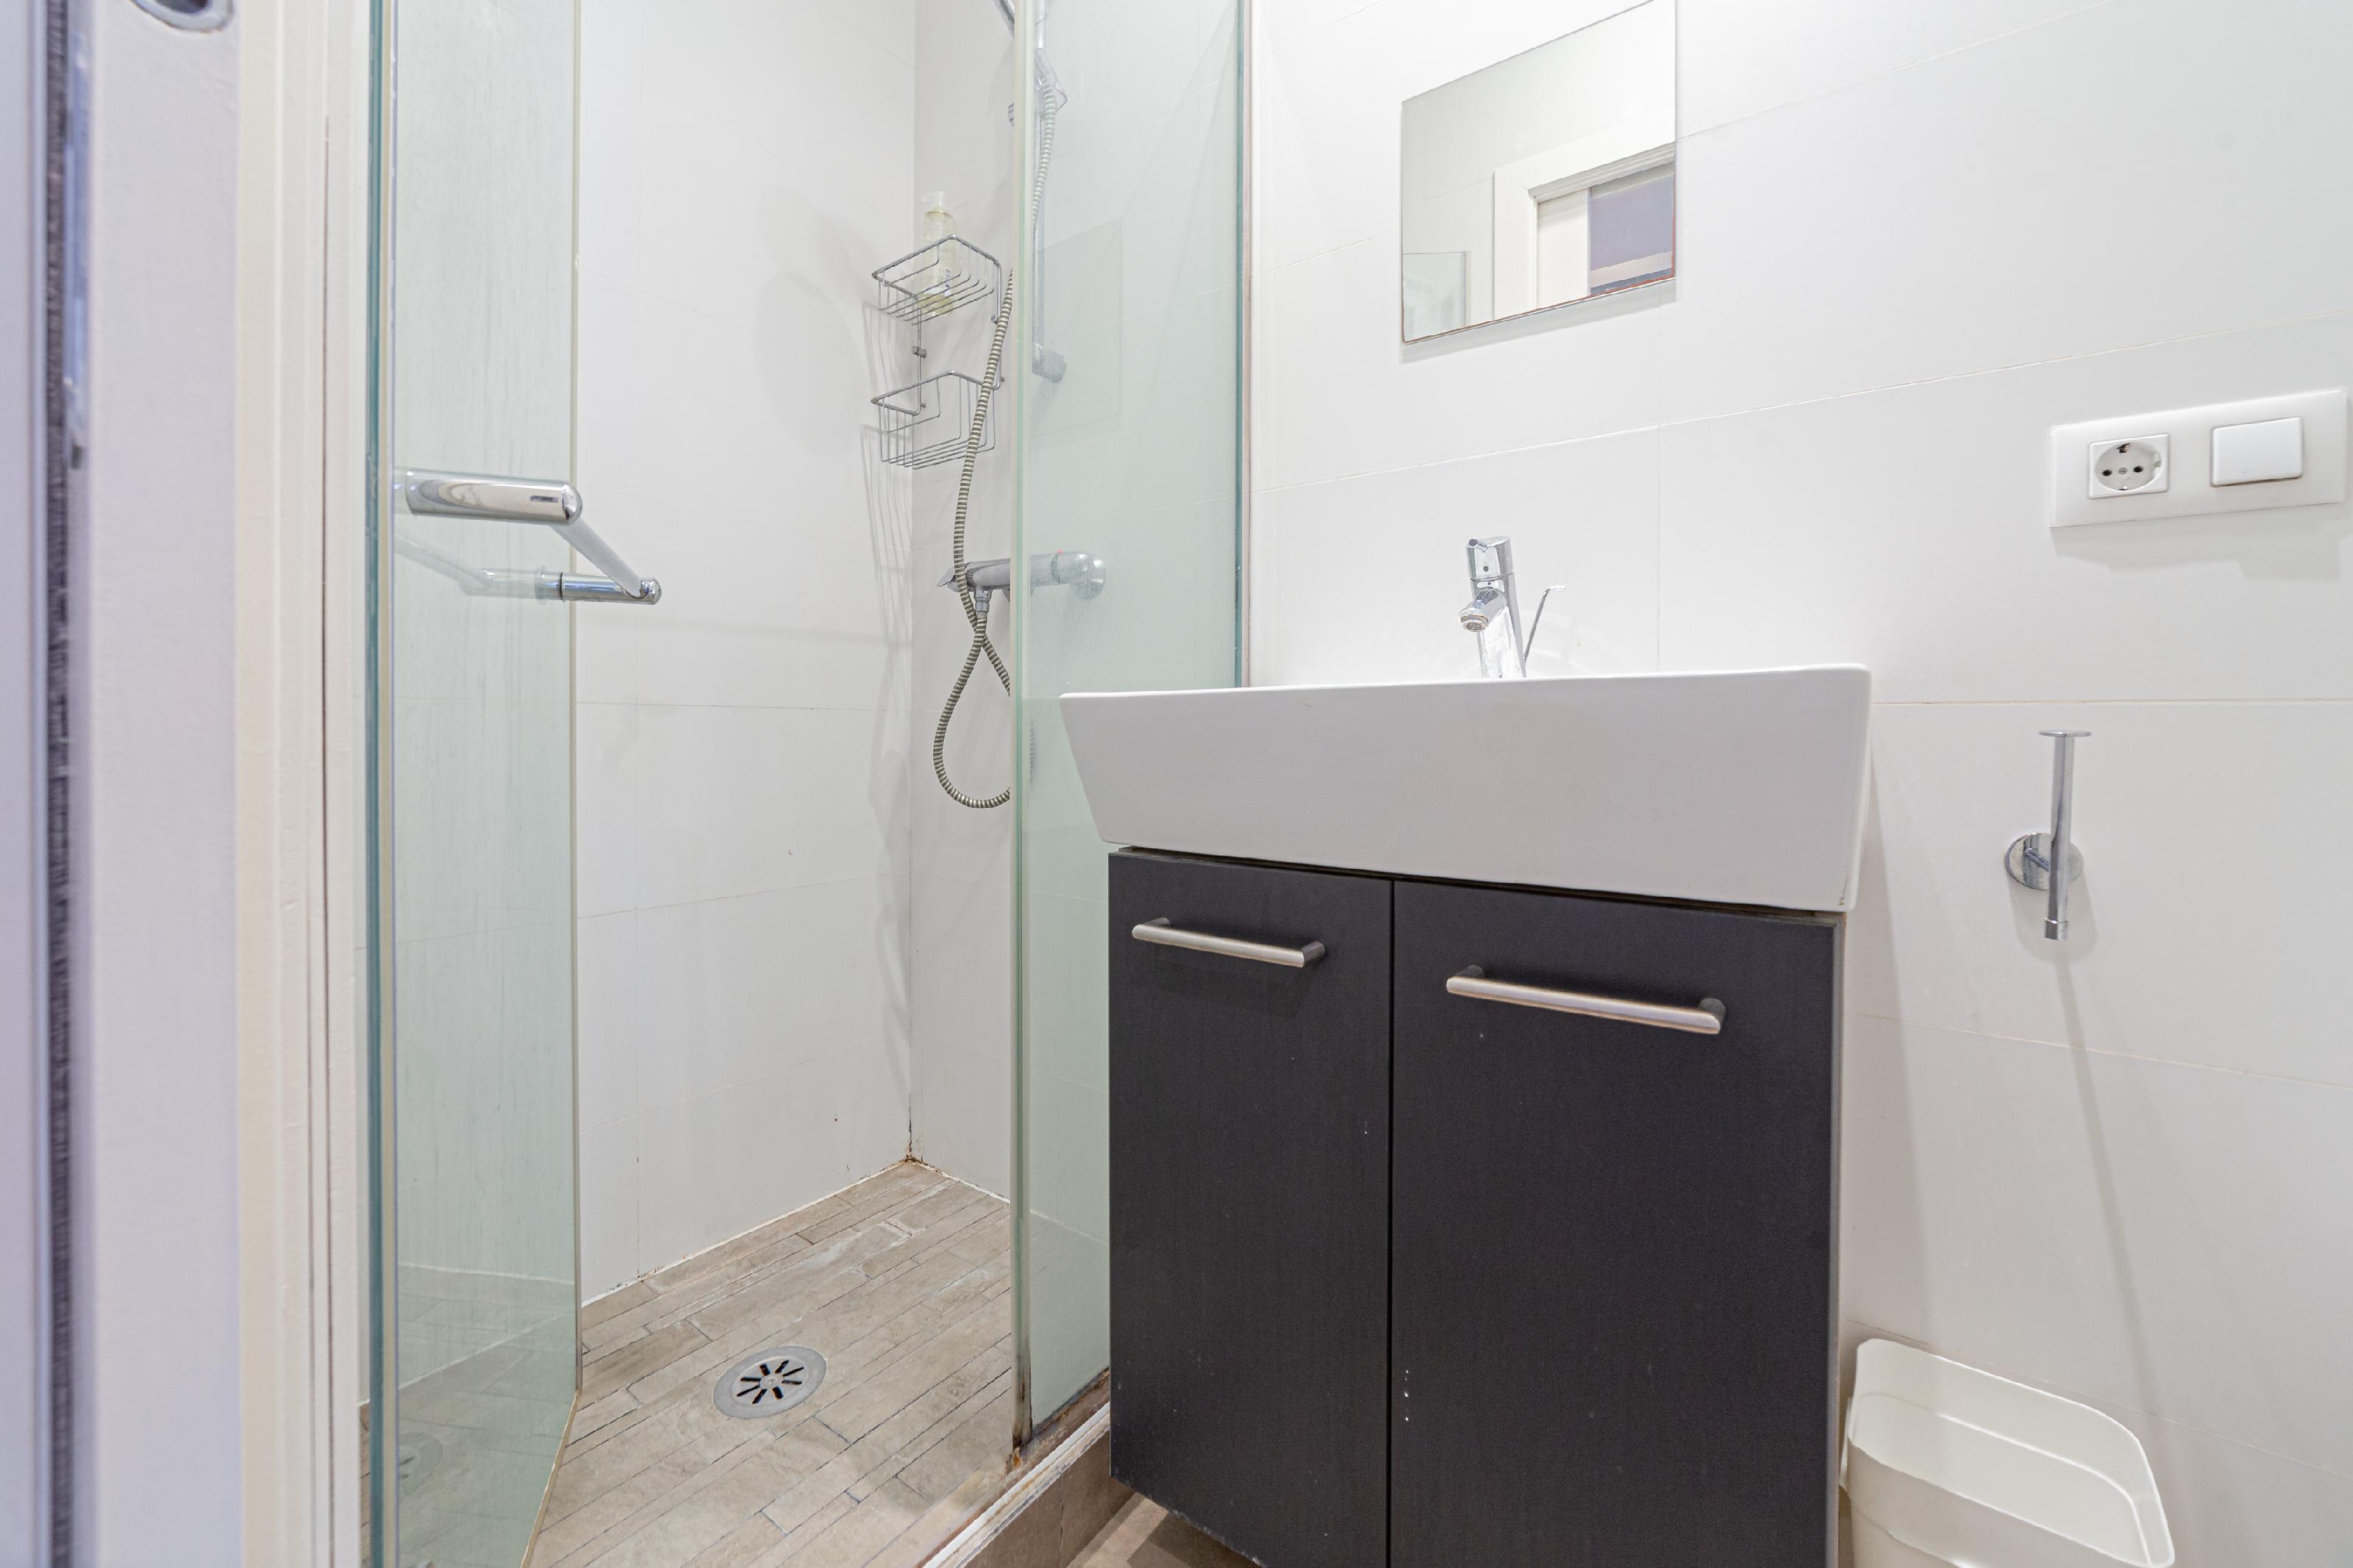 250188 Flat for sale in Sarrià-Sant Gervasi, Sant Gervasi-Galvany 28